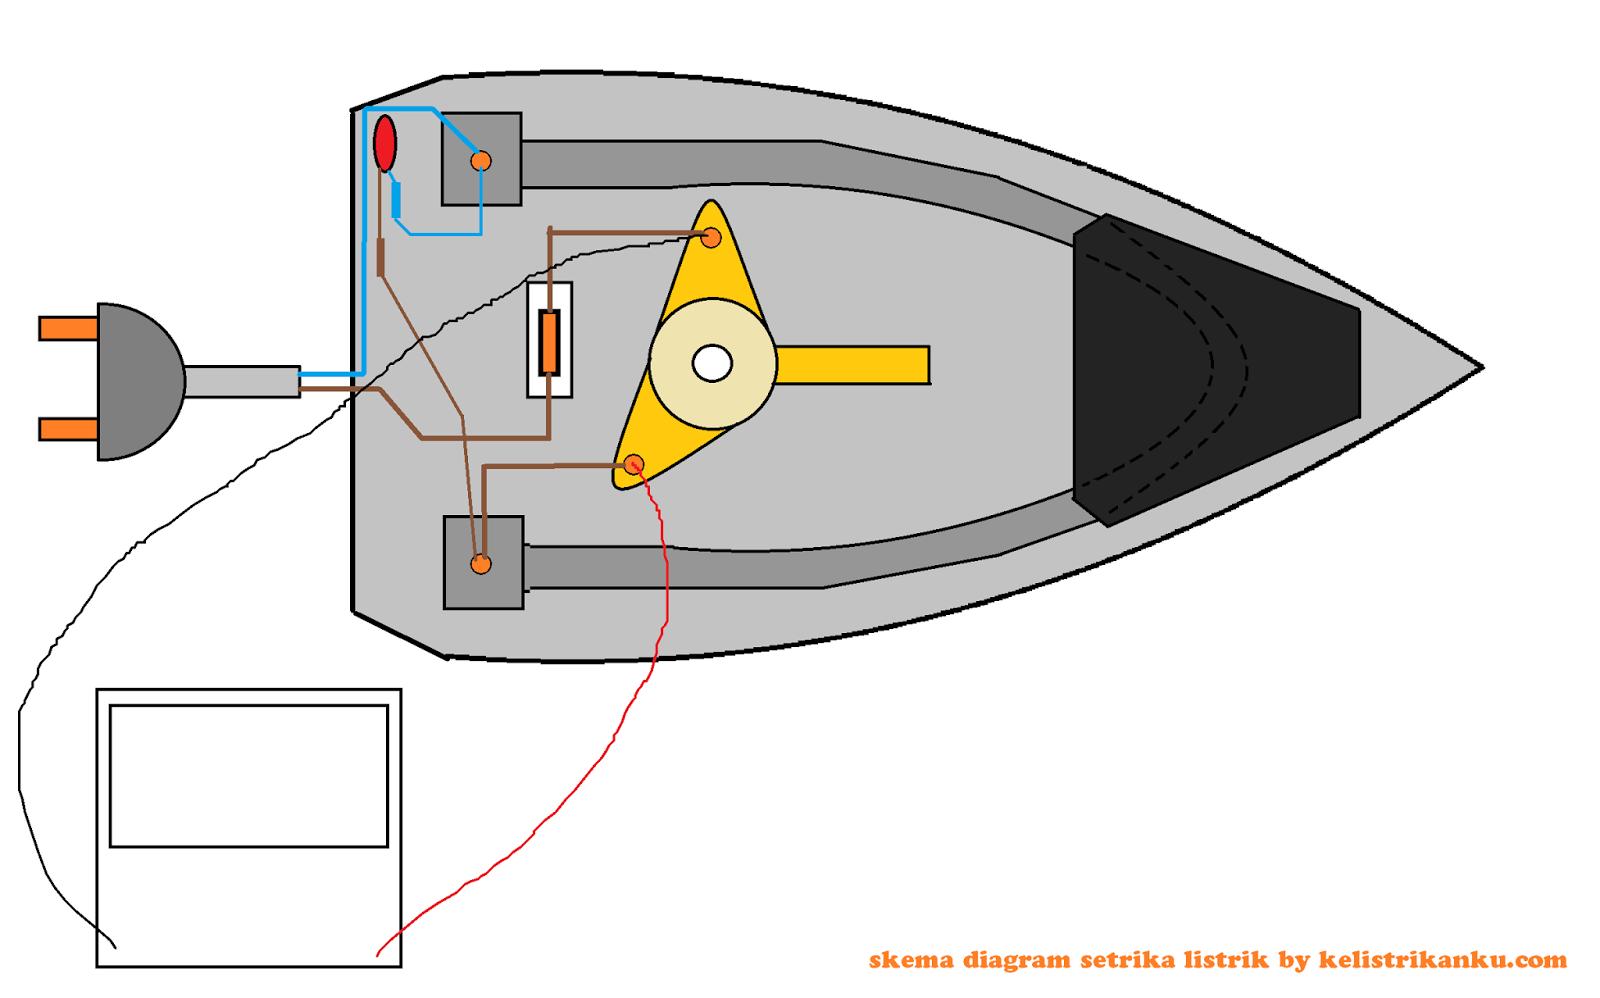 2004 Ford F350 Ke Wiring Diagram 2004 Mitsubishi Galant Wiring Diagram Wiring Diagram ~ ODICIS